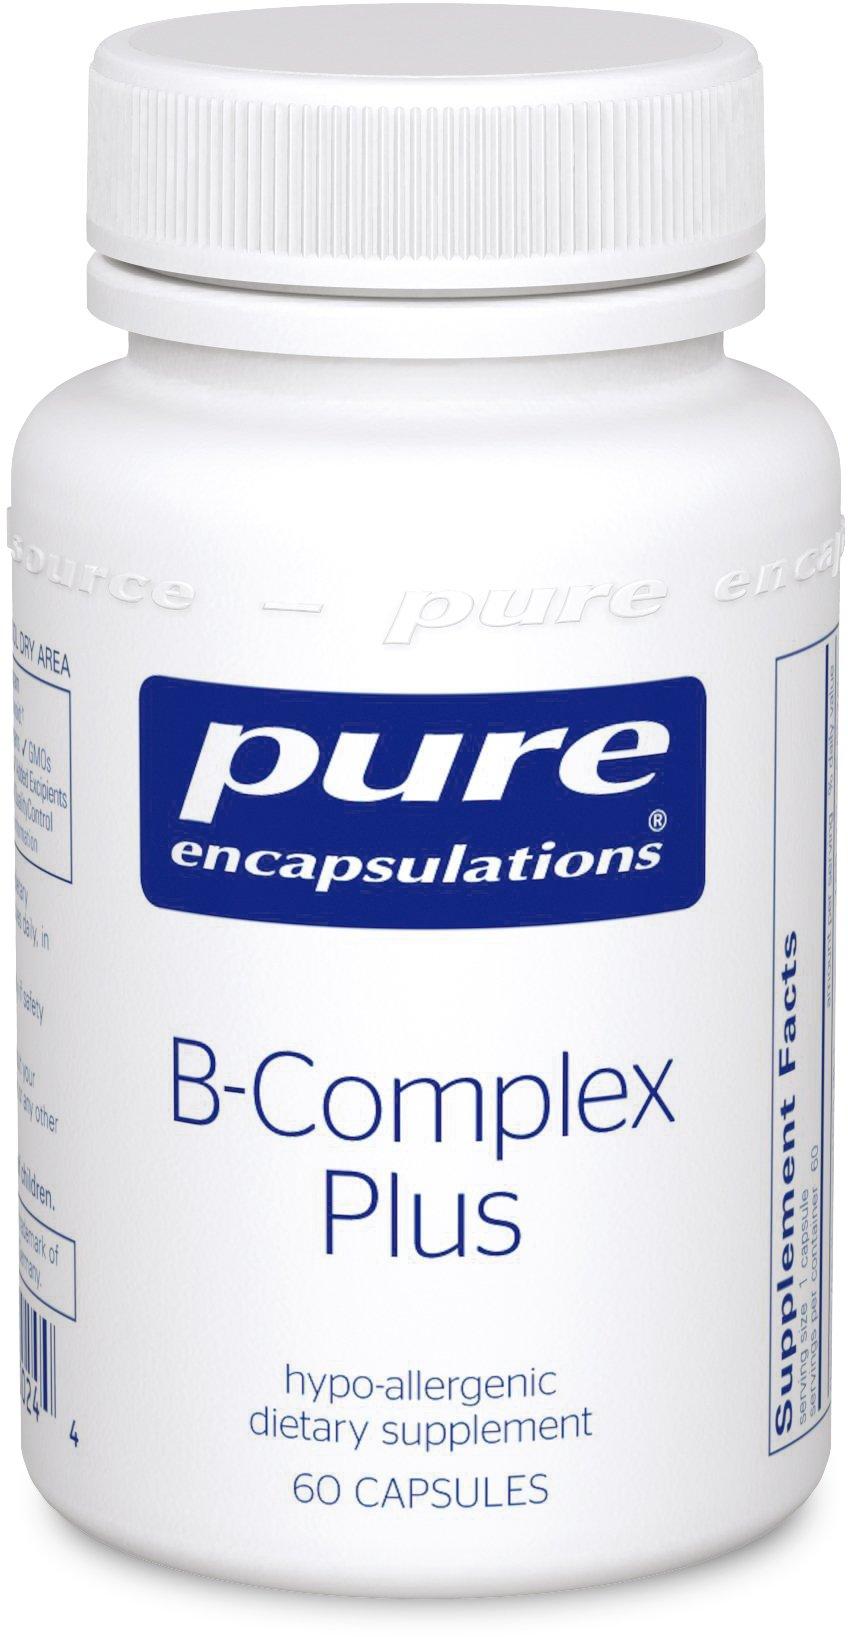 Pure Encapsulations - B-Complex Plus - Balanced B Vitamin Formula with Metafolin® L-5-MTHF and Vitamin B12-60 Capsules